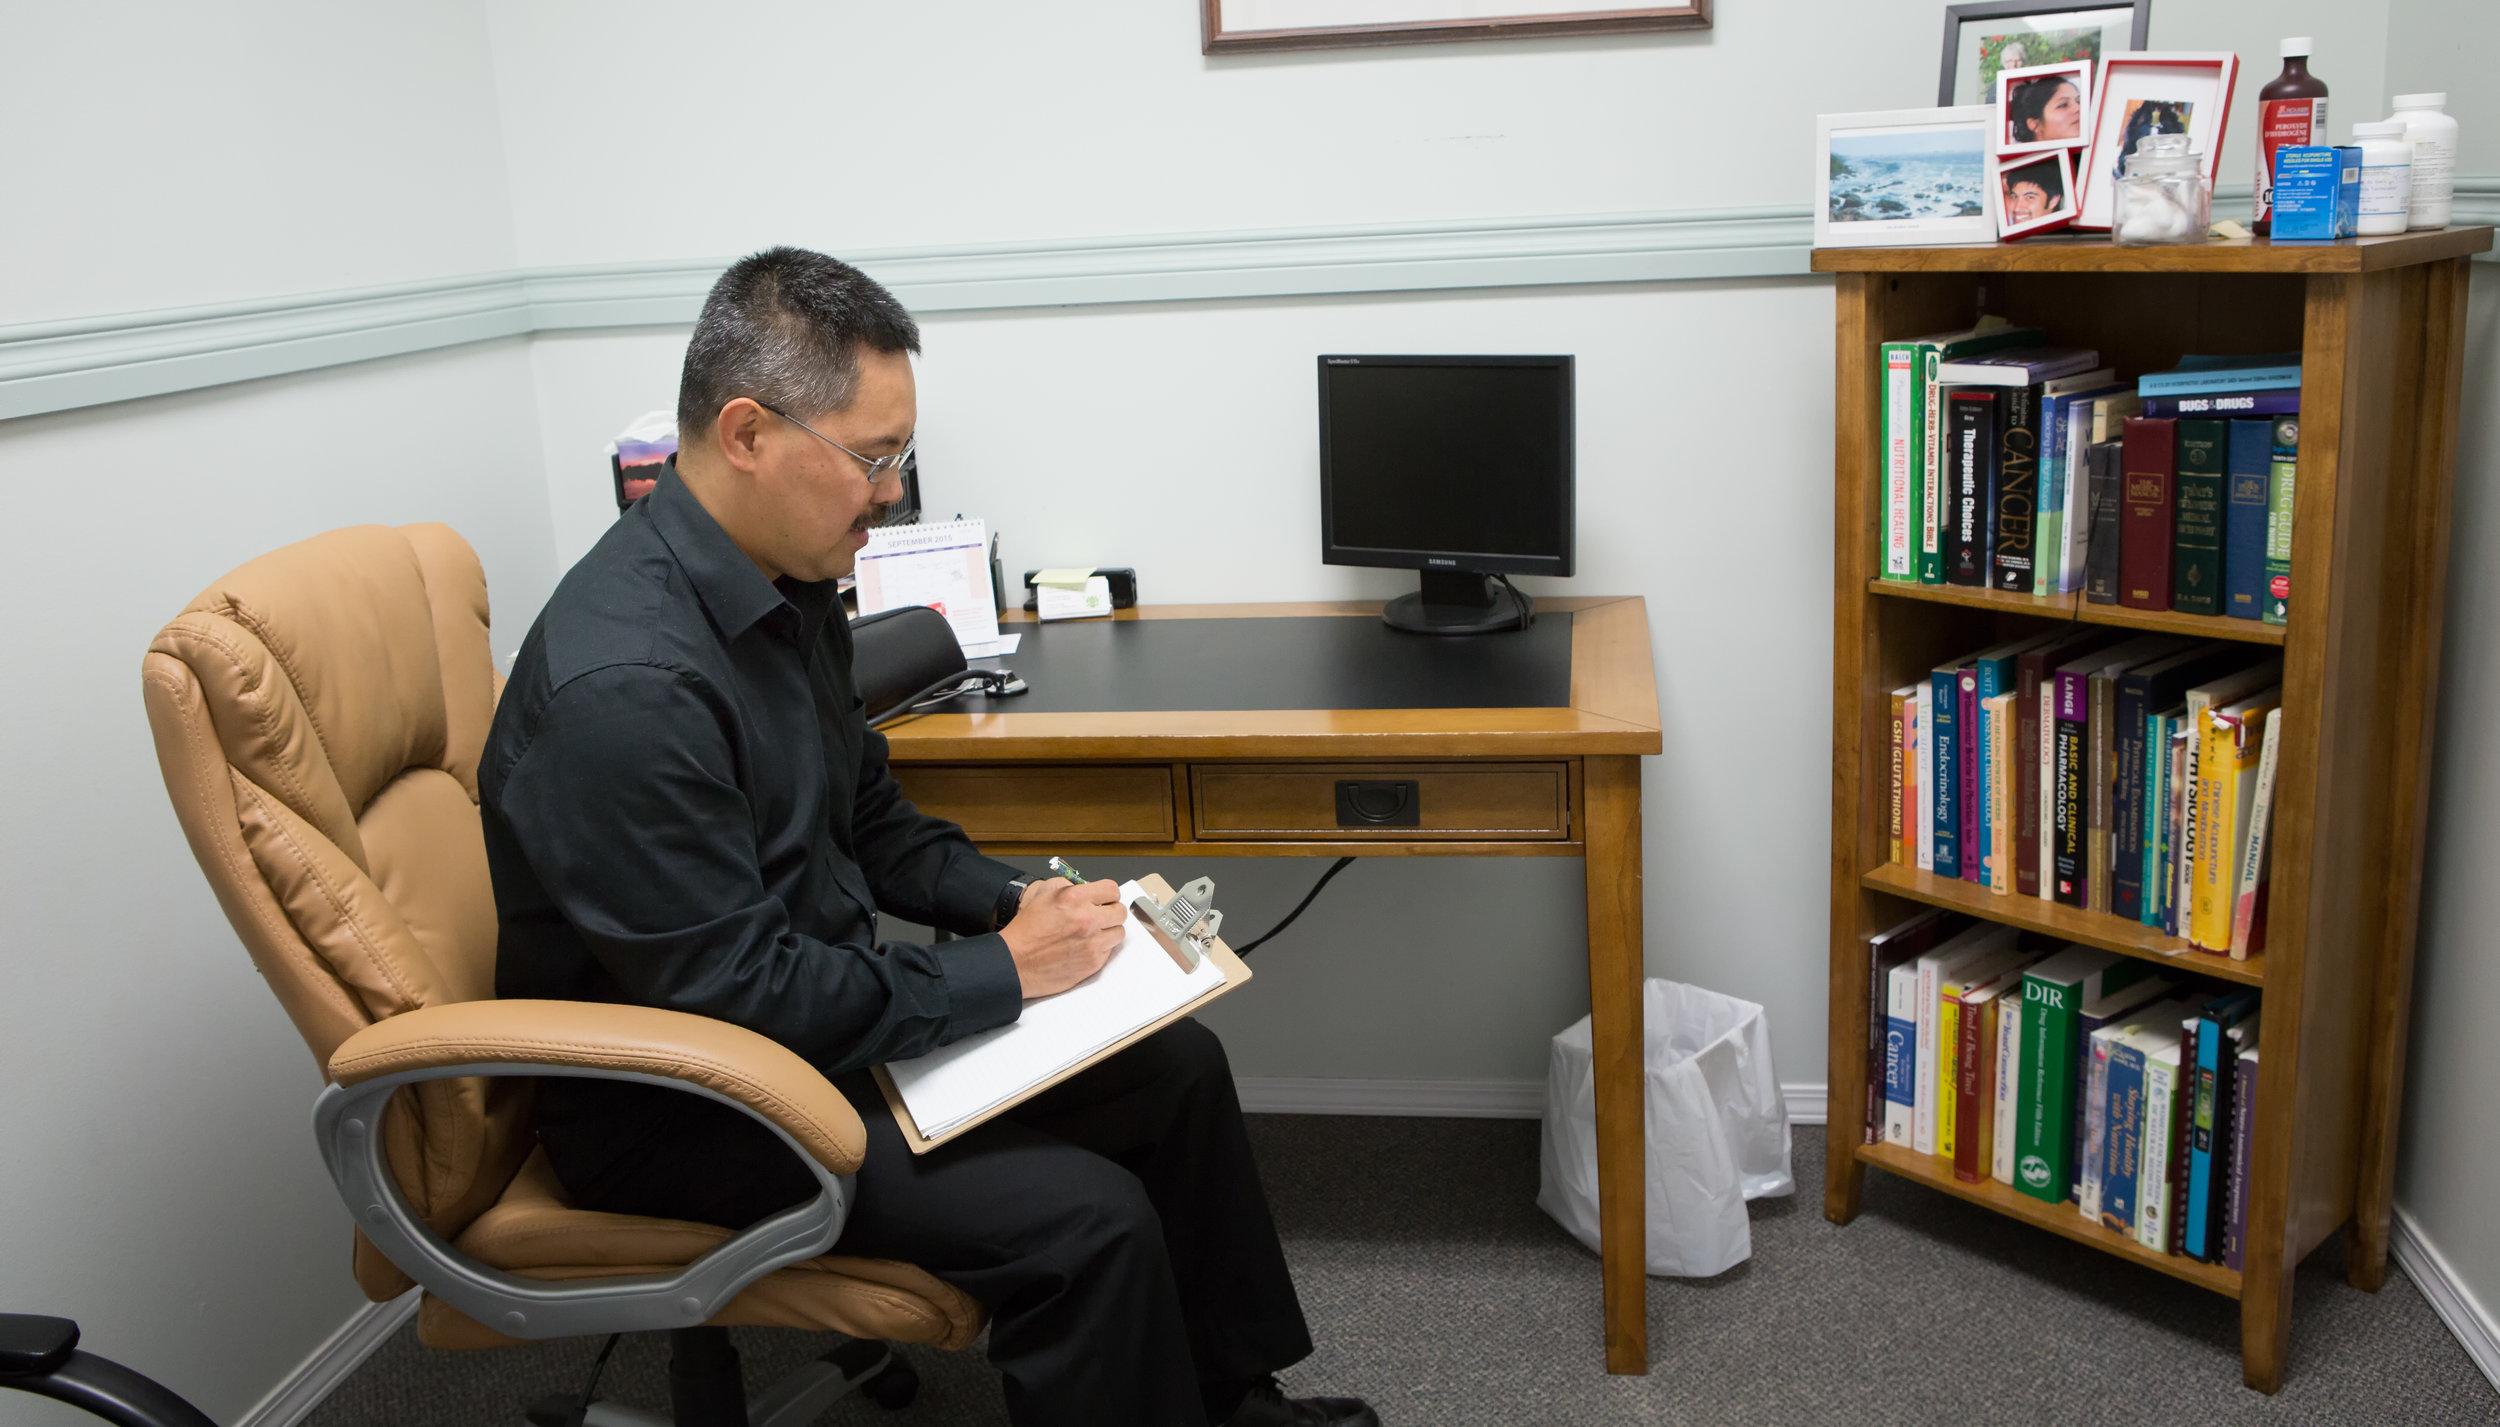 John writing at desk